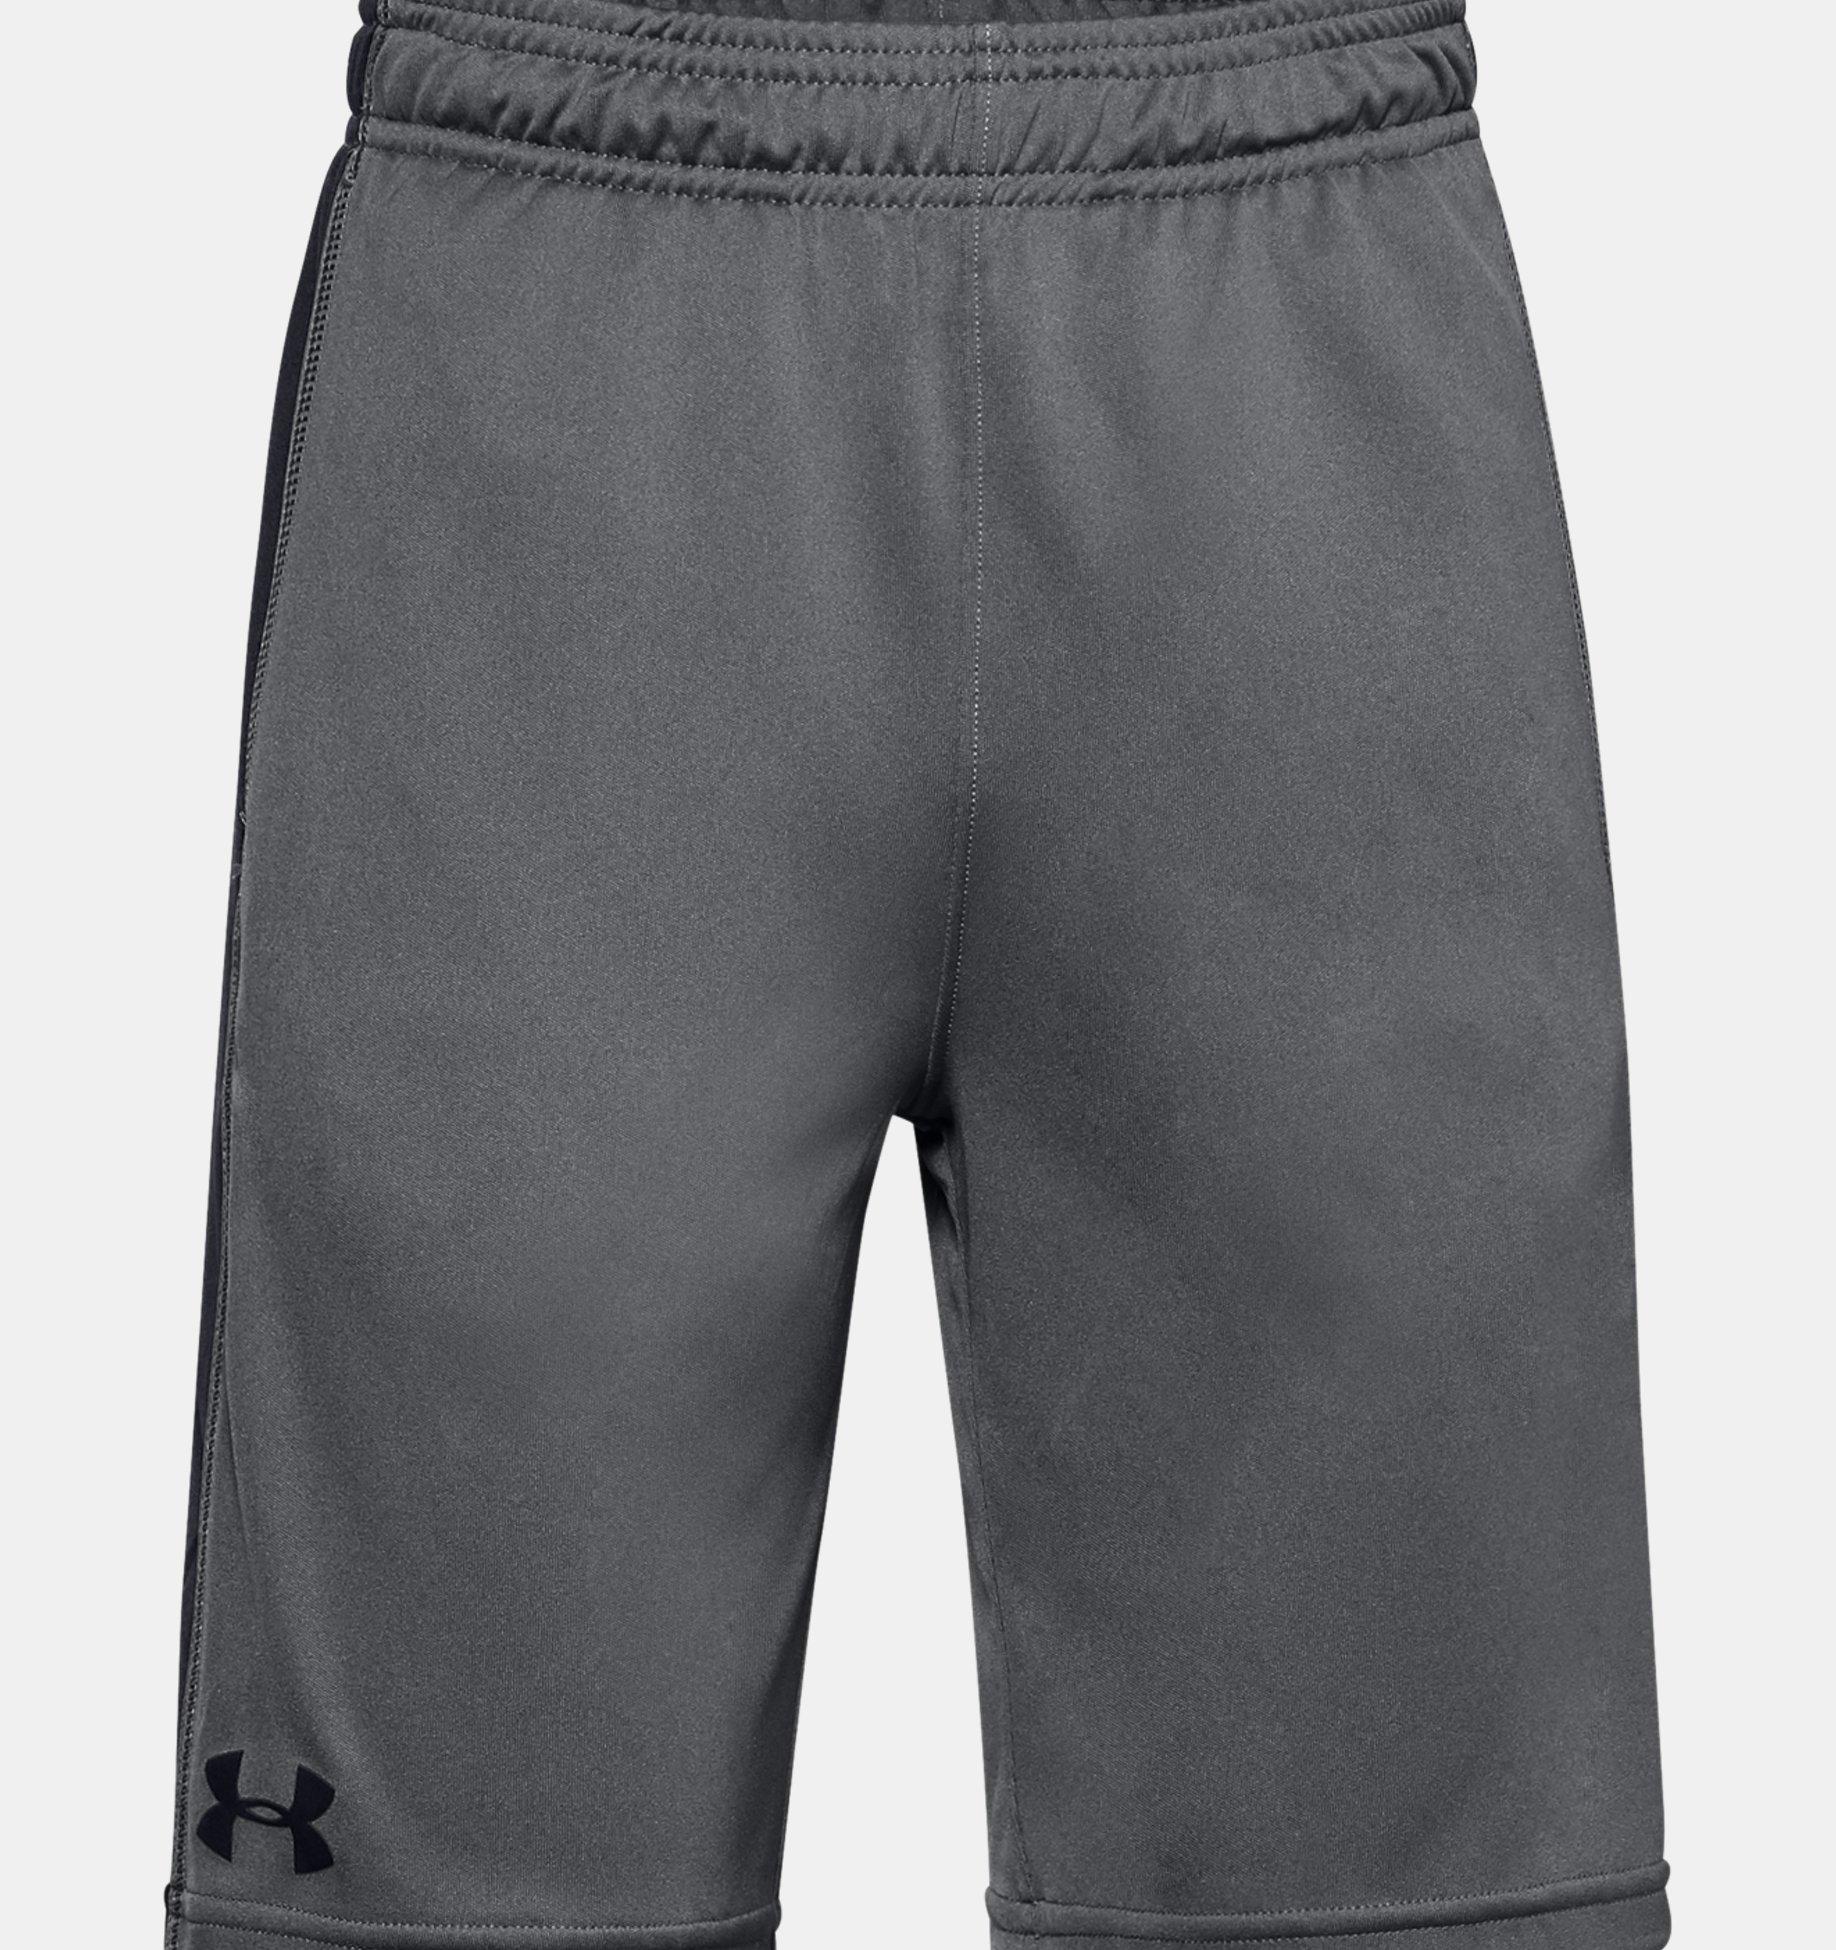 Underarmour Boys UA Velocity 2.0 Shorts